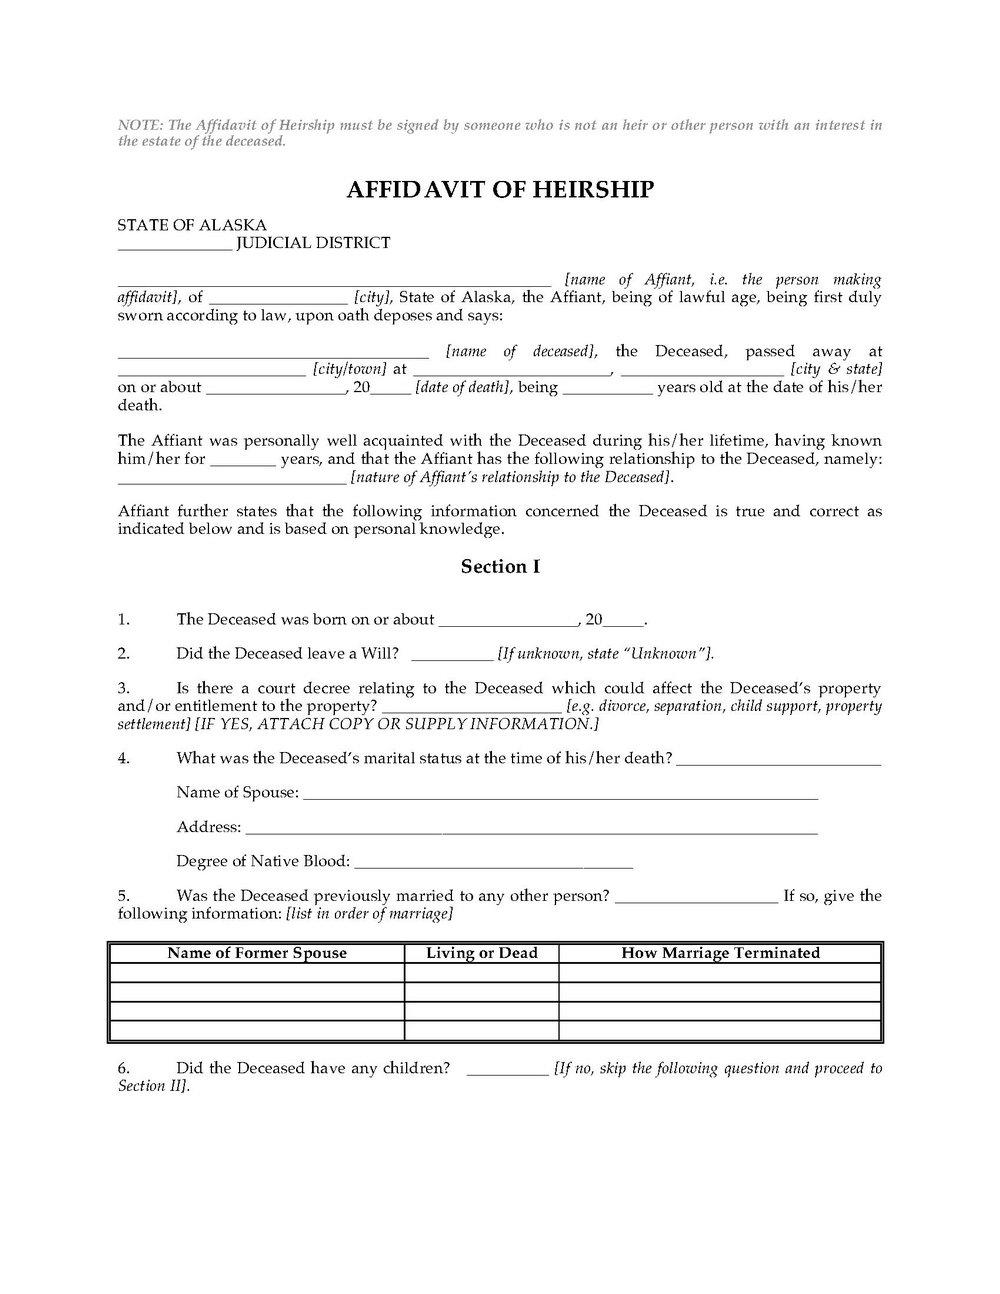 Free Affidavit Of Heirship Form California